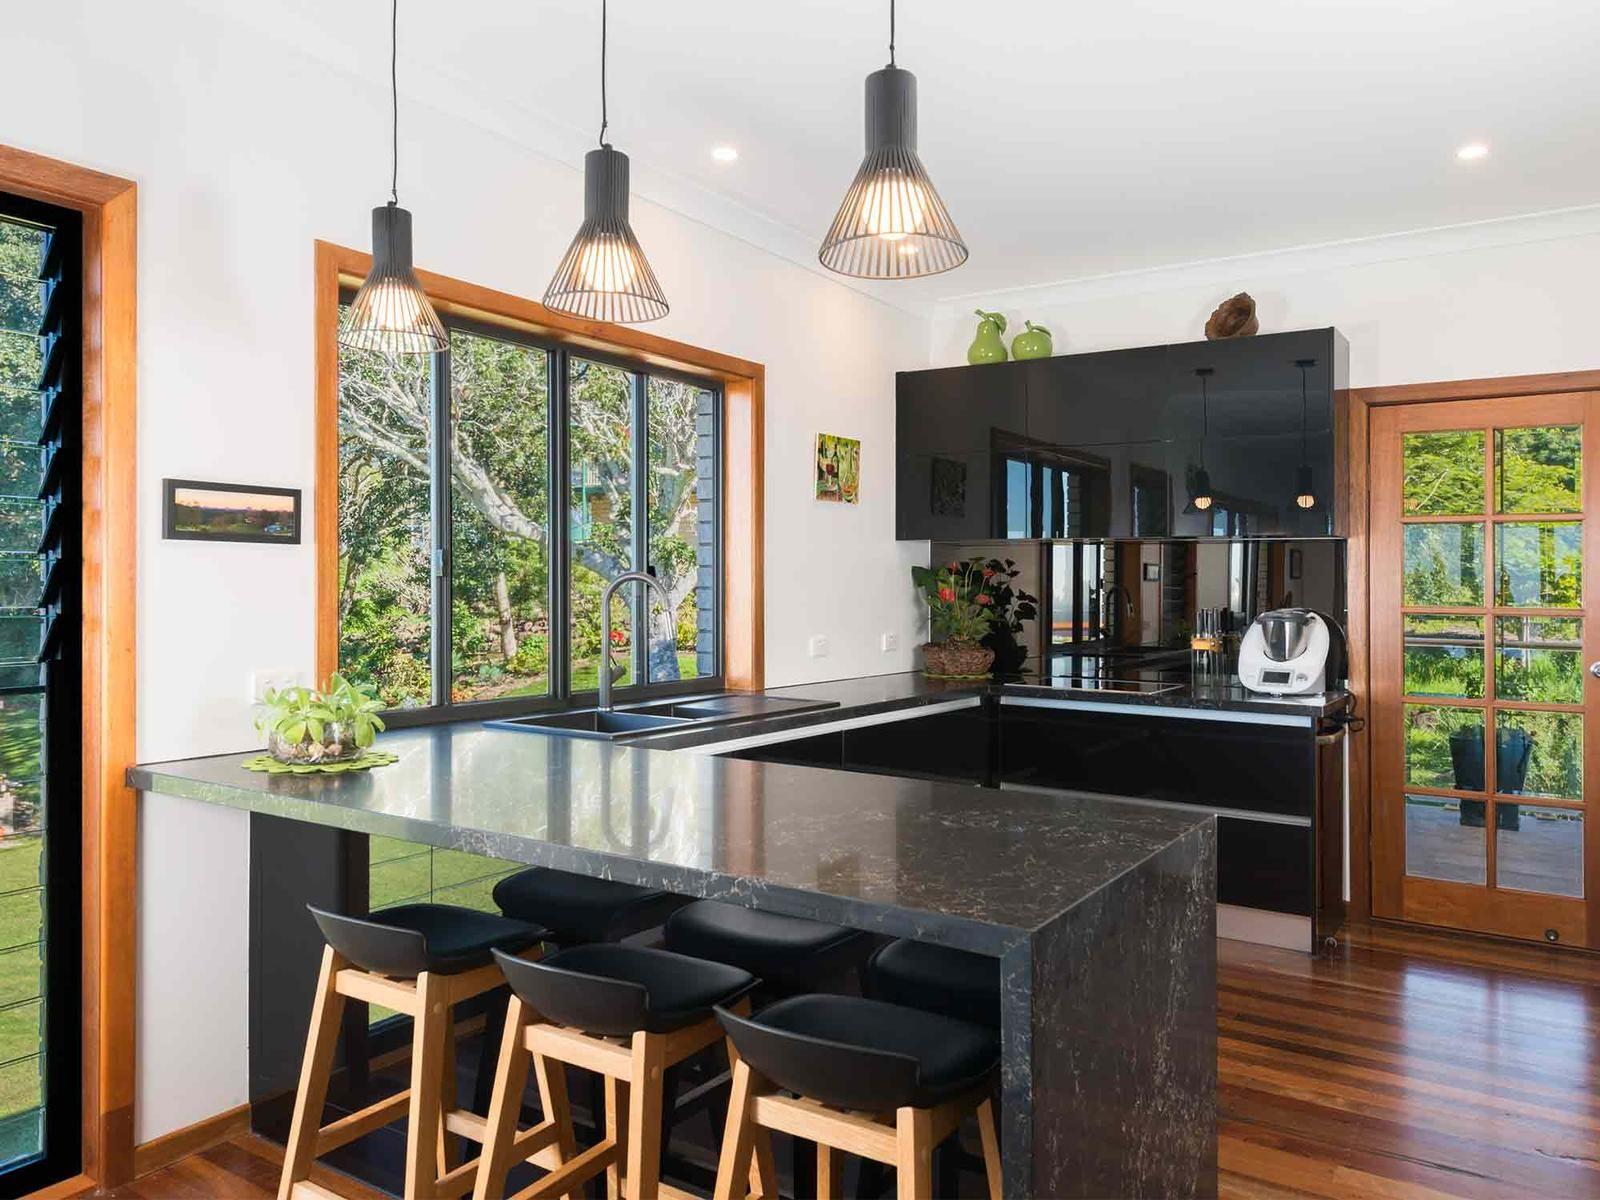 u shaped kitchen designs kitchen ideas 2018 luxury kitchen design condo kitchen remodel on u kitchen ideas small id=64991